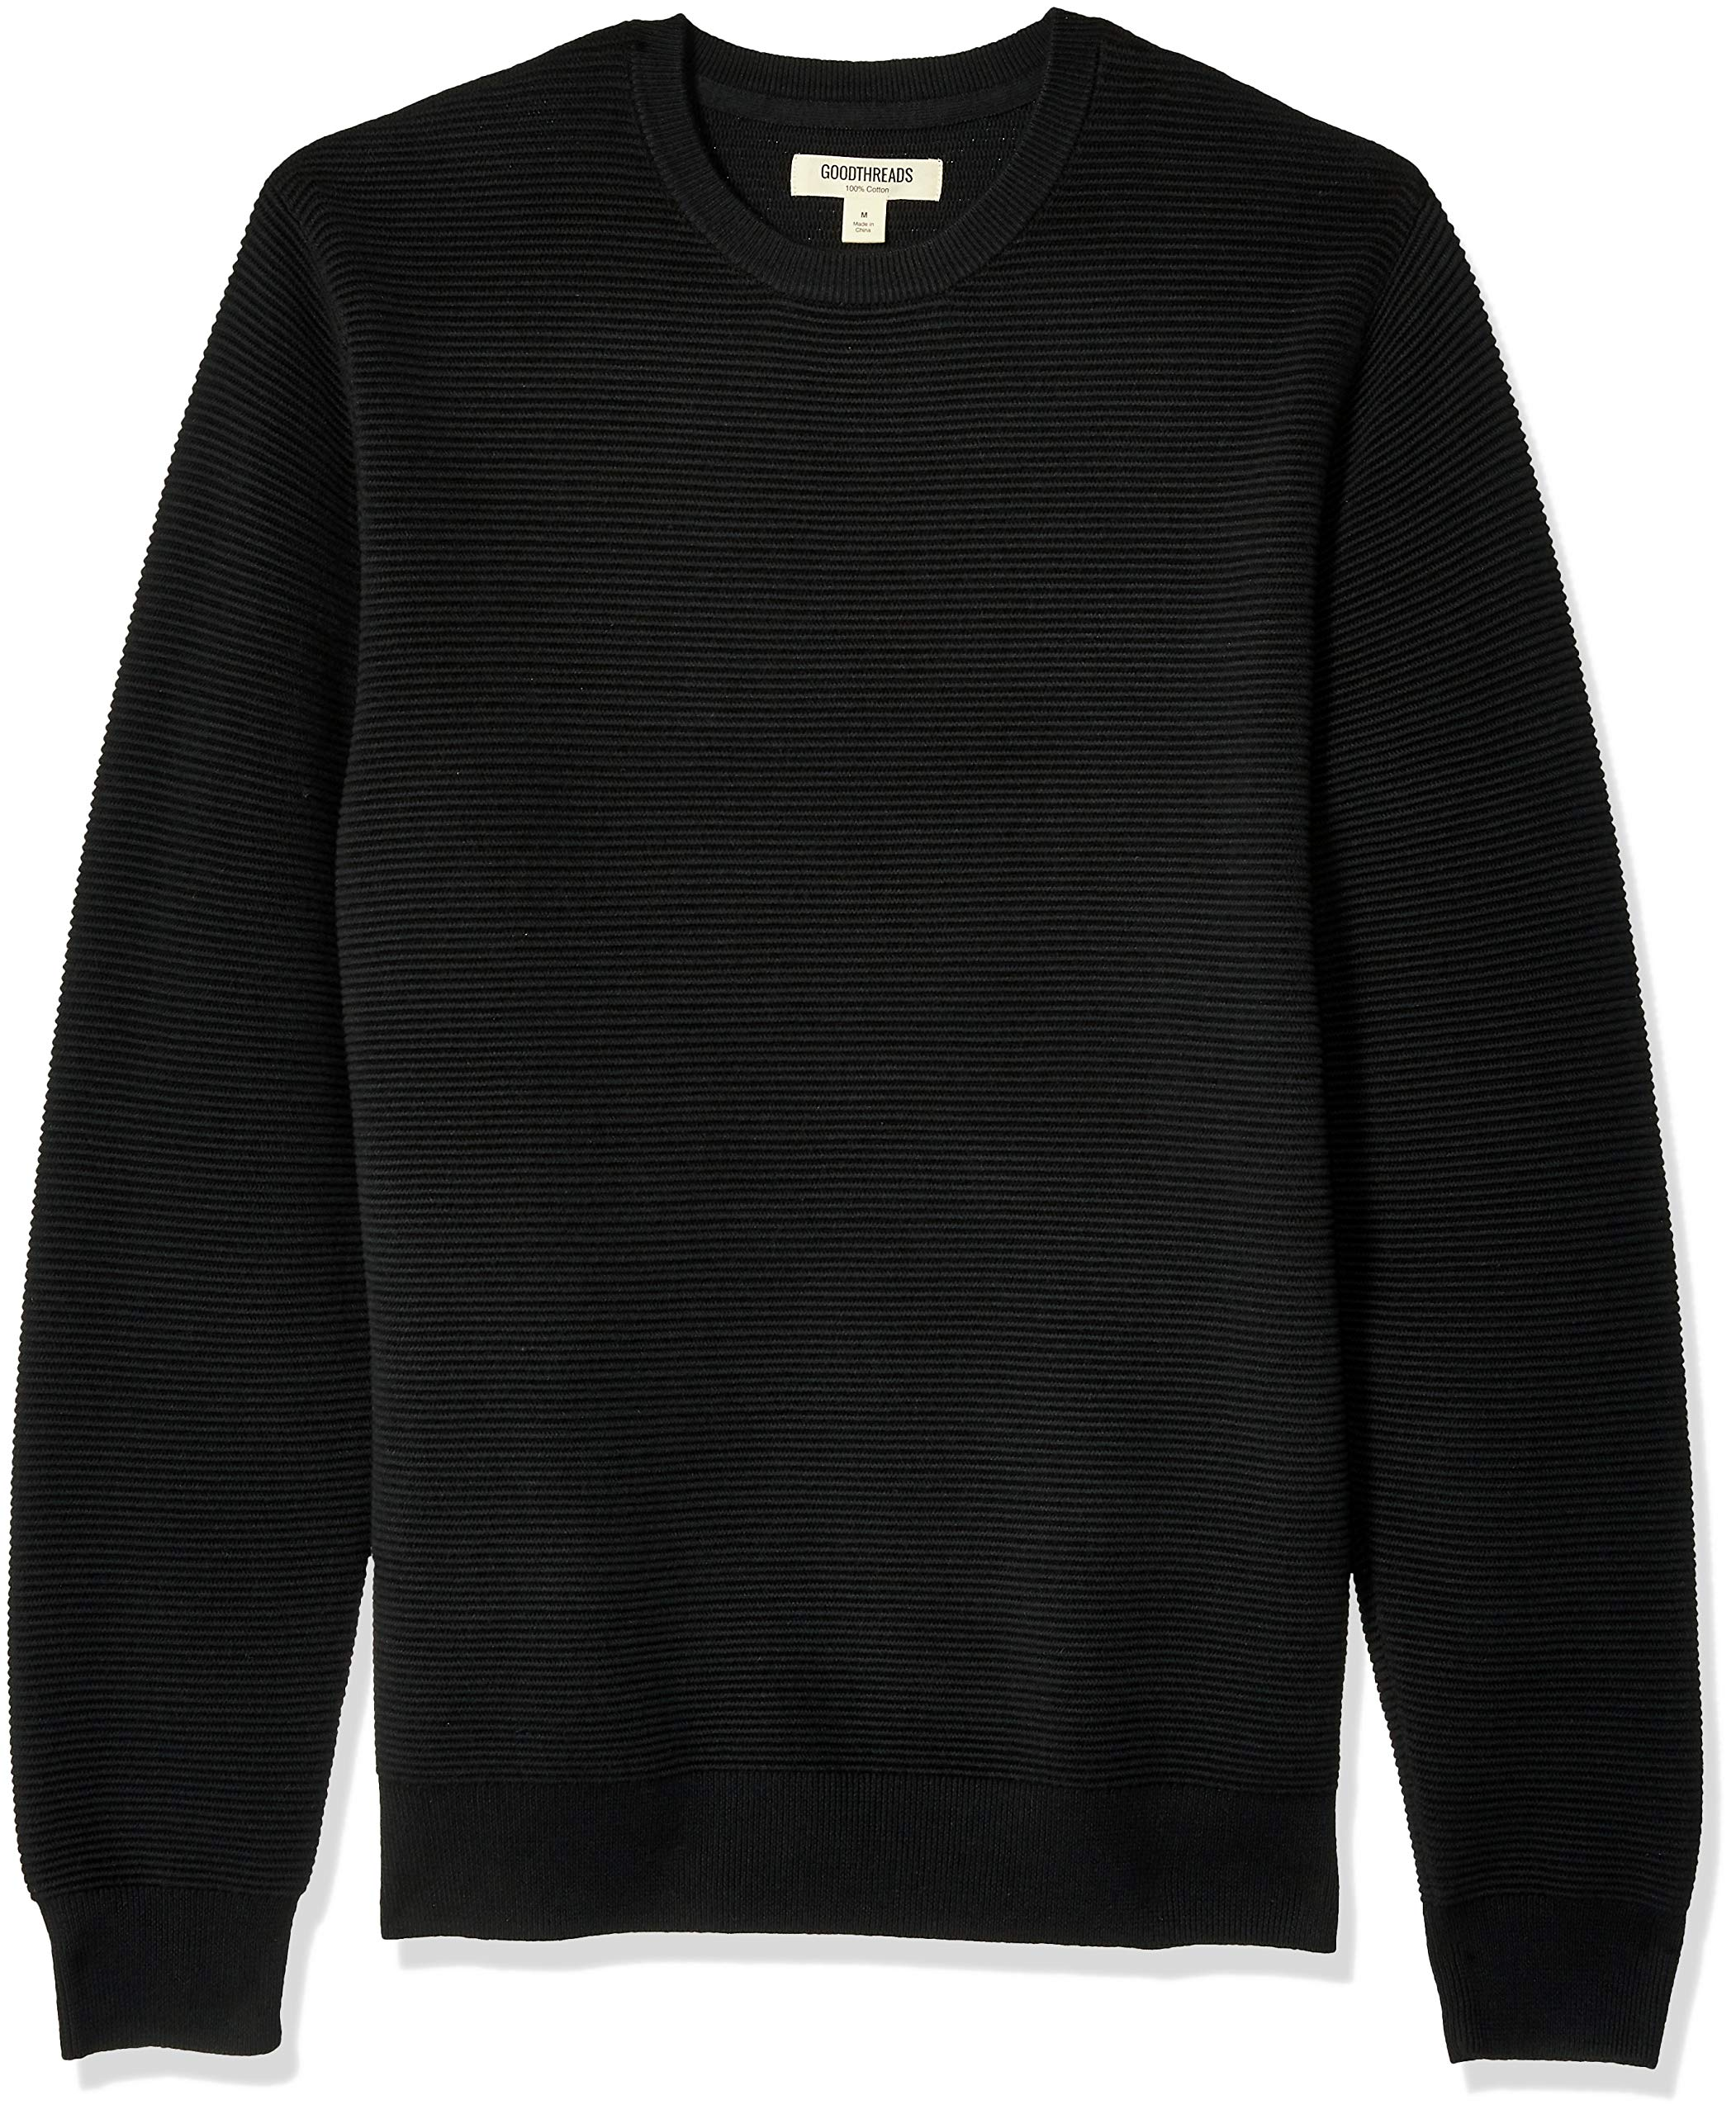 Goodthreads Men's Soft Cotton Ottoman Stitch Crewneck Sweater, Black Large